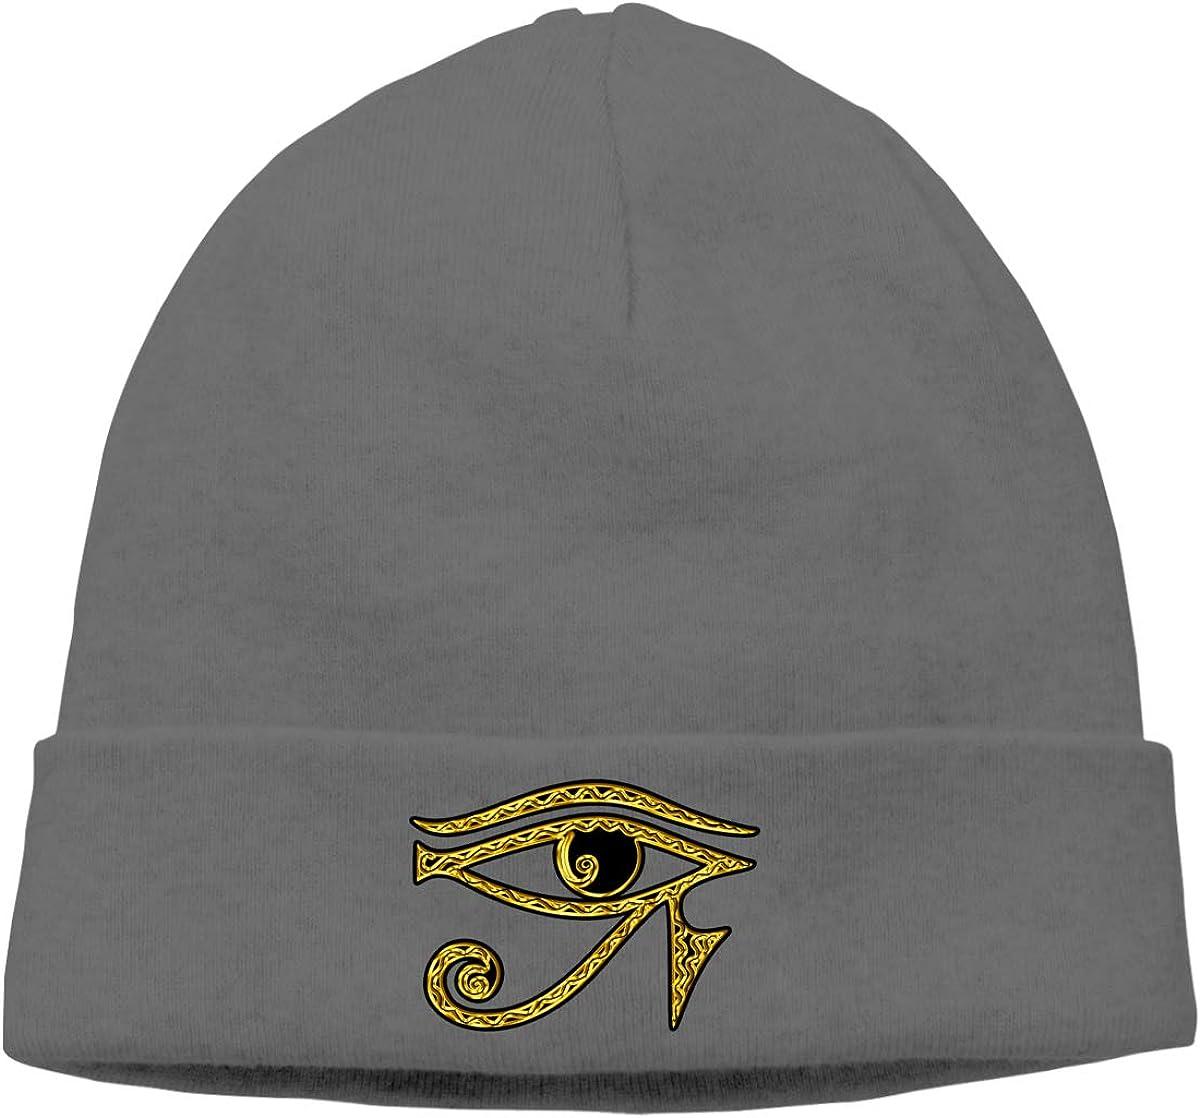 Riokk az Eye Horus Reverse Knit Cap Beanie Skull for Mens Deep Heather